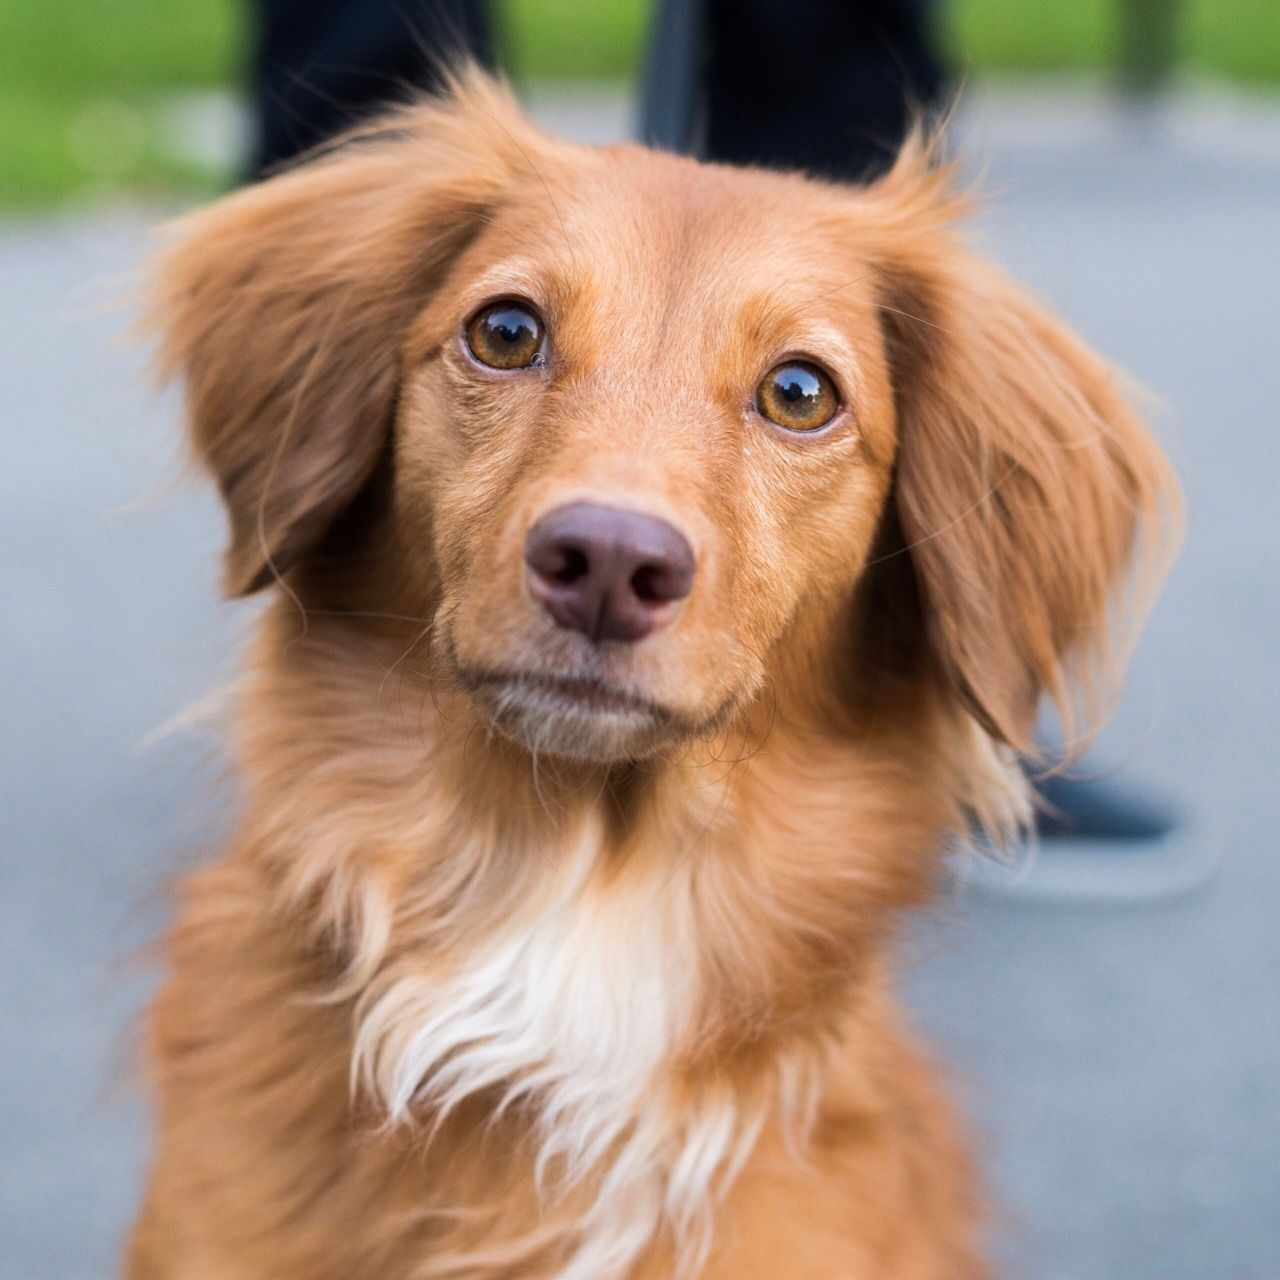 Babe Is An Adoptable Dog Nova Scotia Duck Tolling Retriever Corgi Mix Searching For A Forever Fam Dog Adoption Corgi Mix Nova Scotia Duck Tolling Retriever